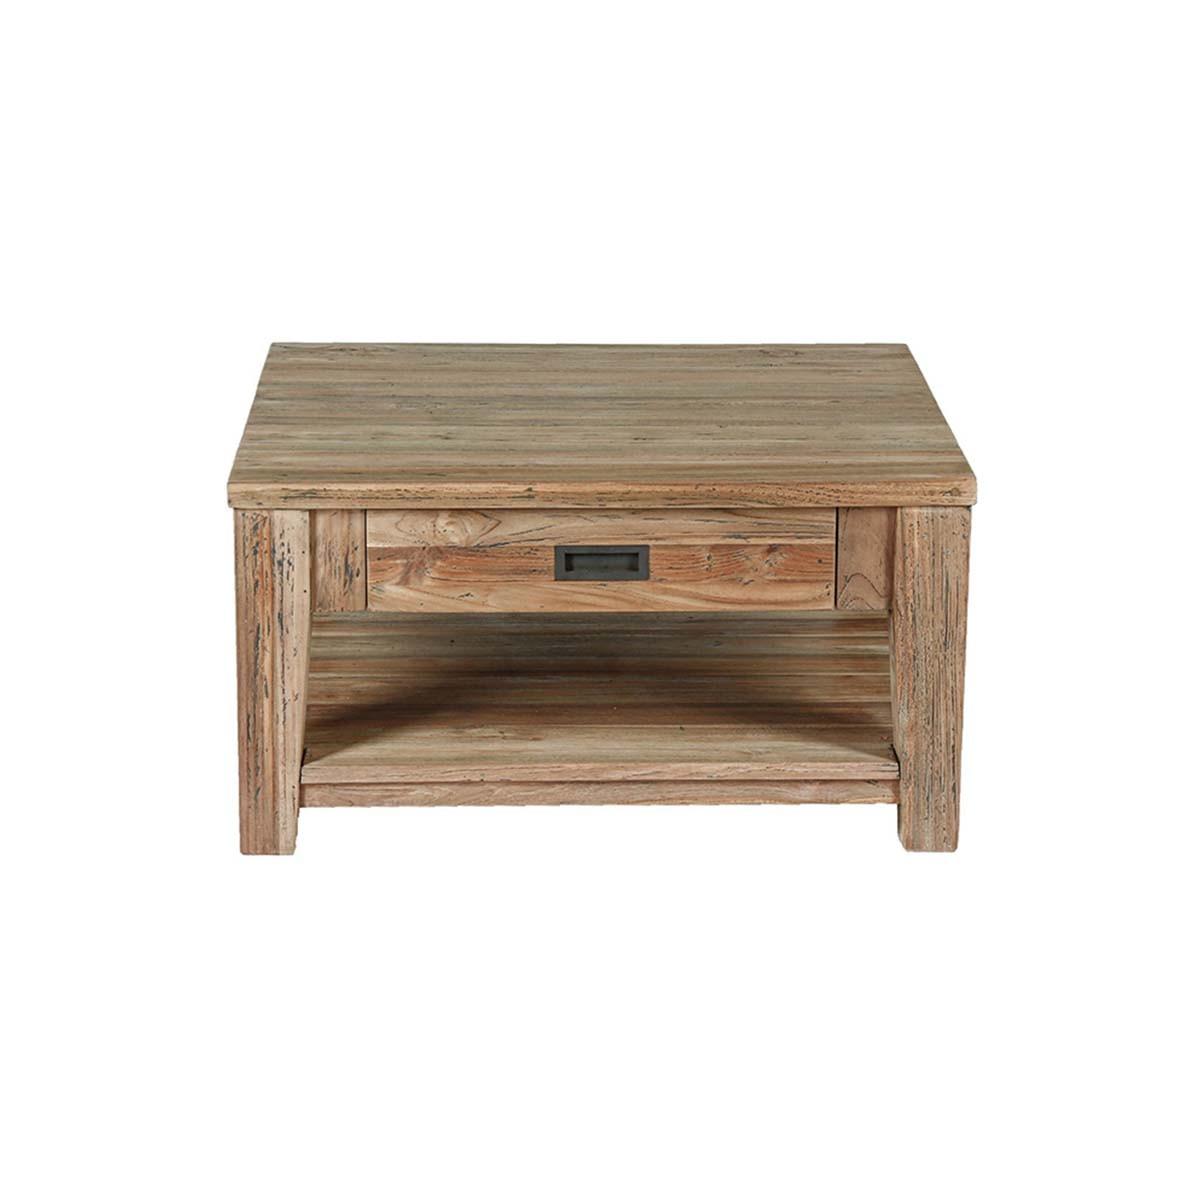 Table basse 1 tiroir en teck recyclé